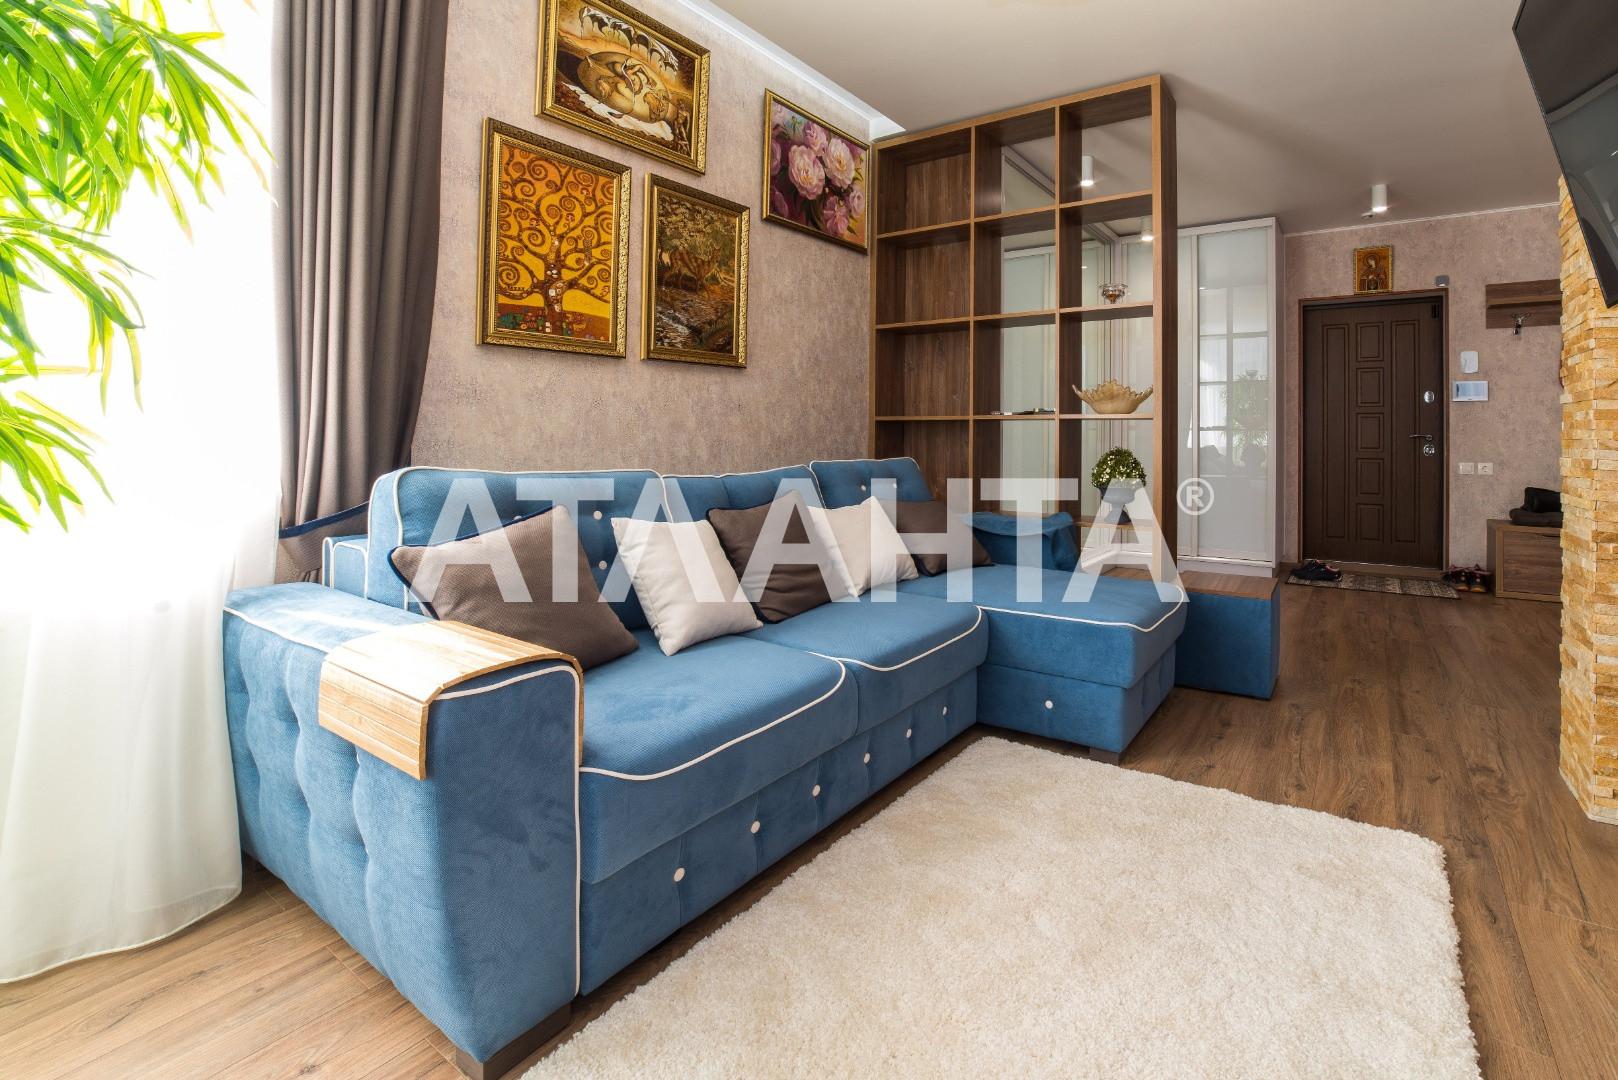 Продается 1-комнатная Квартира на ул. Балковская (Фрунзе) — 50 000 у.е. (фото №13)